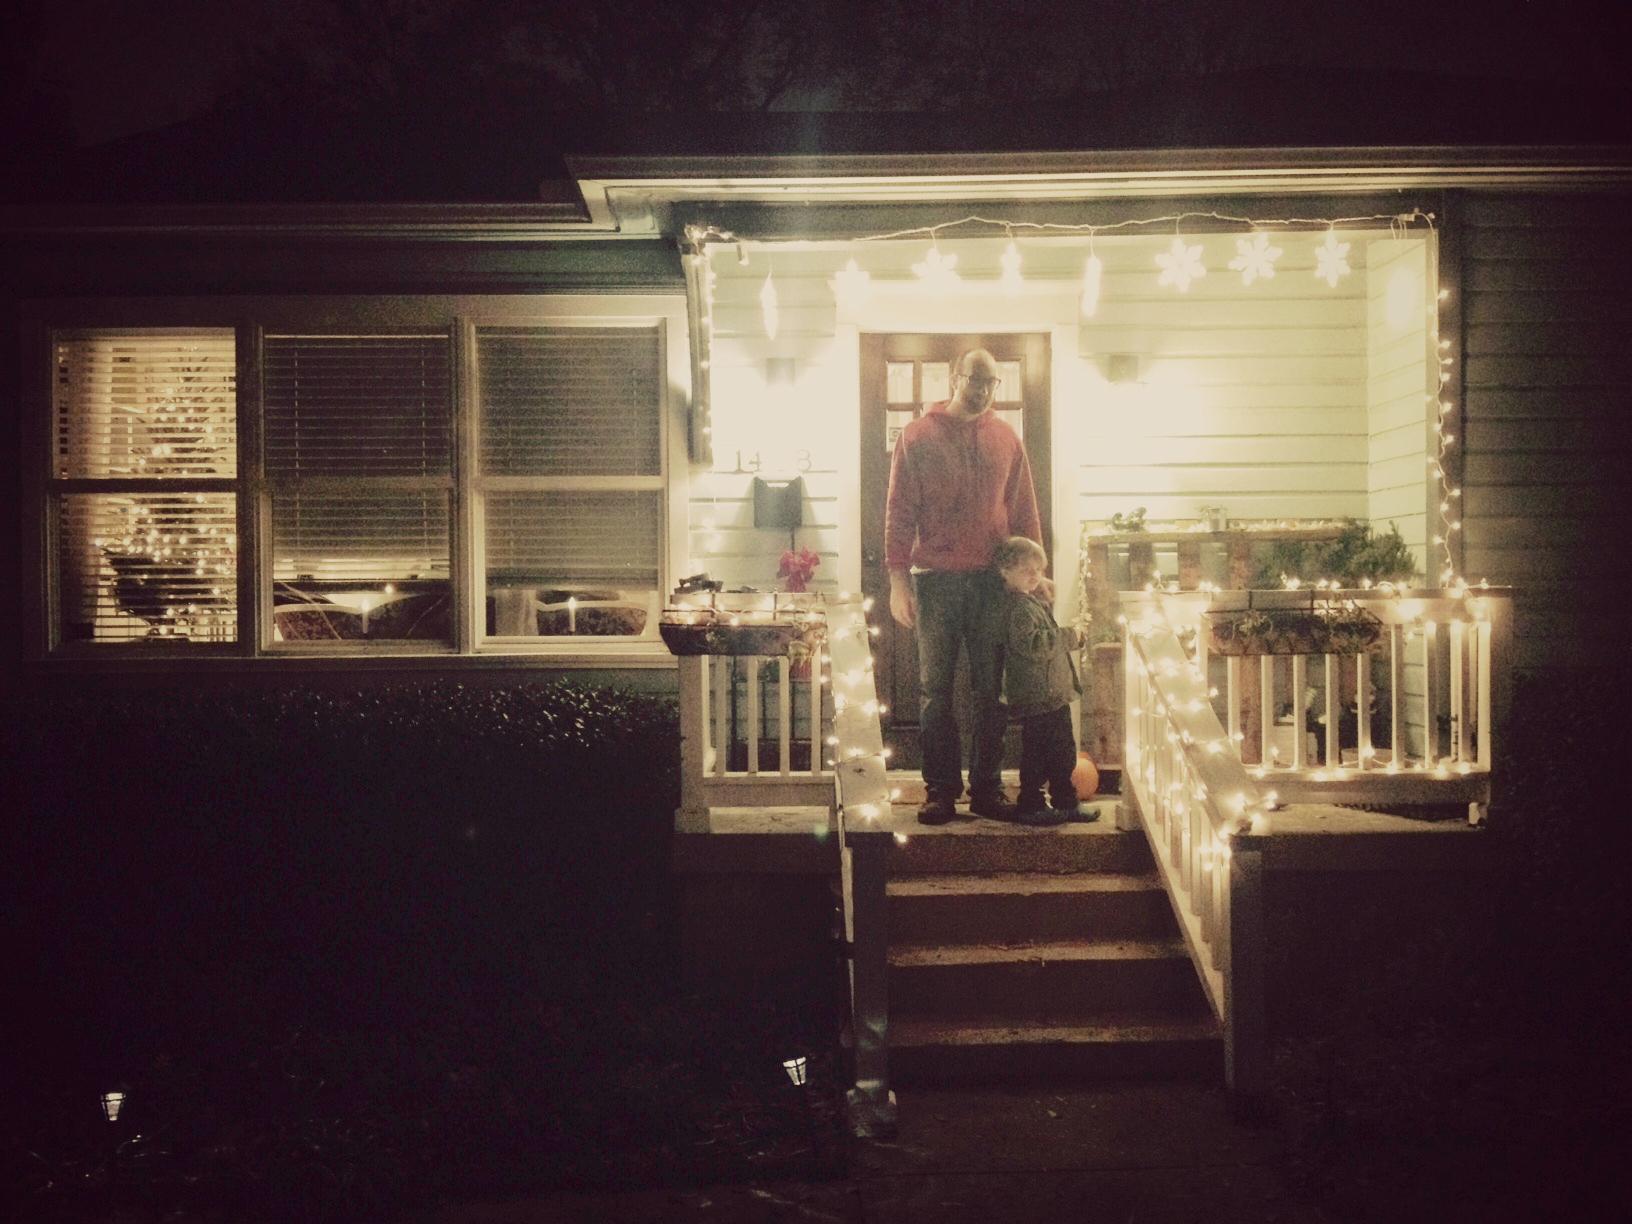 Christmas Decorations Outside House